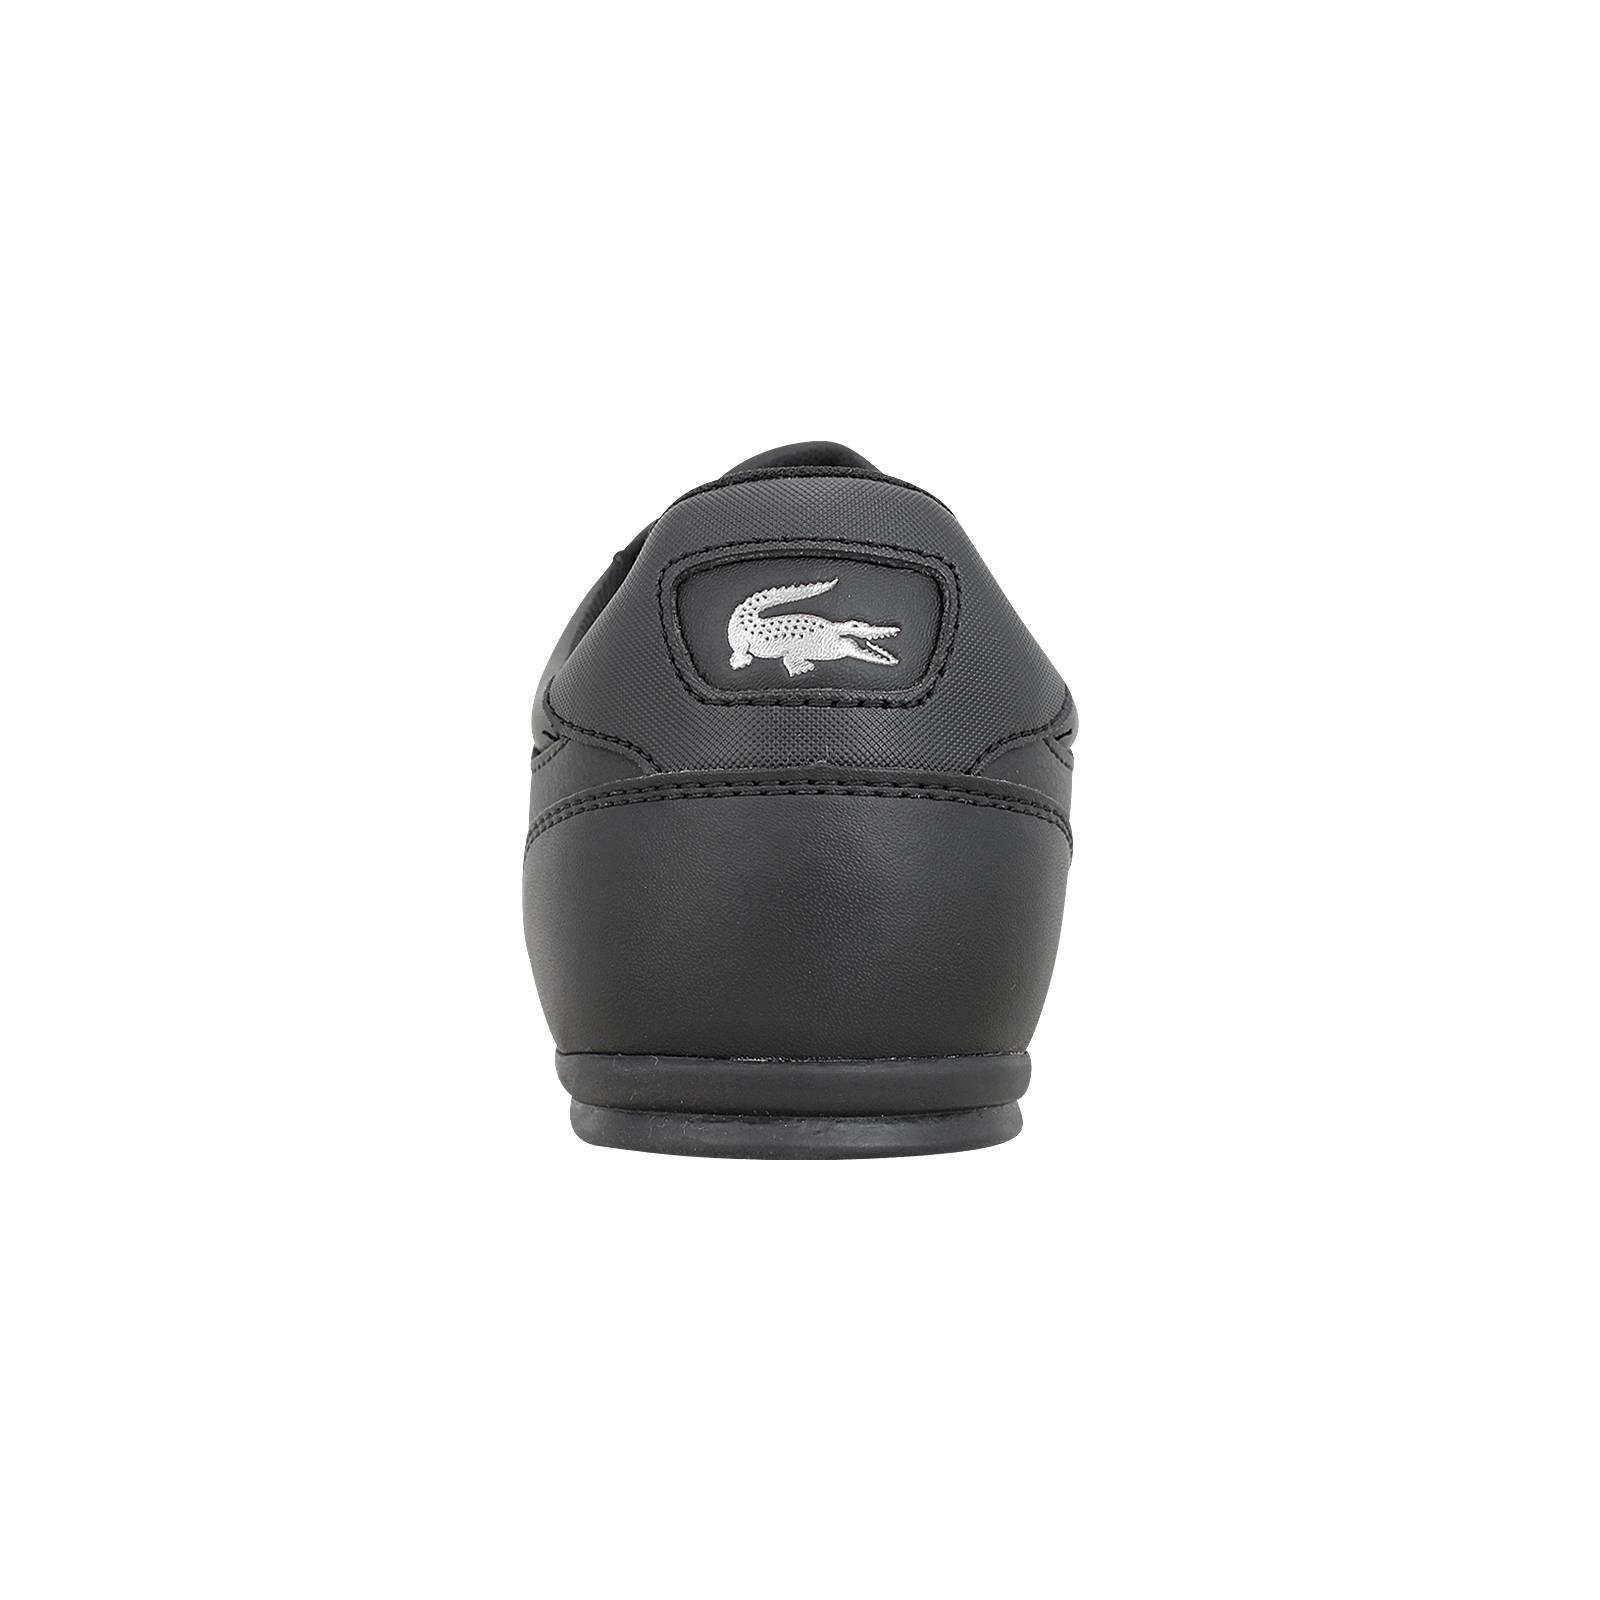 9cdfb2e1e2f5 Chaymon BL 1 CMA - Lacoste Men s casual shoes made of leather and ...